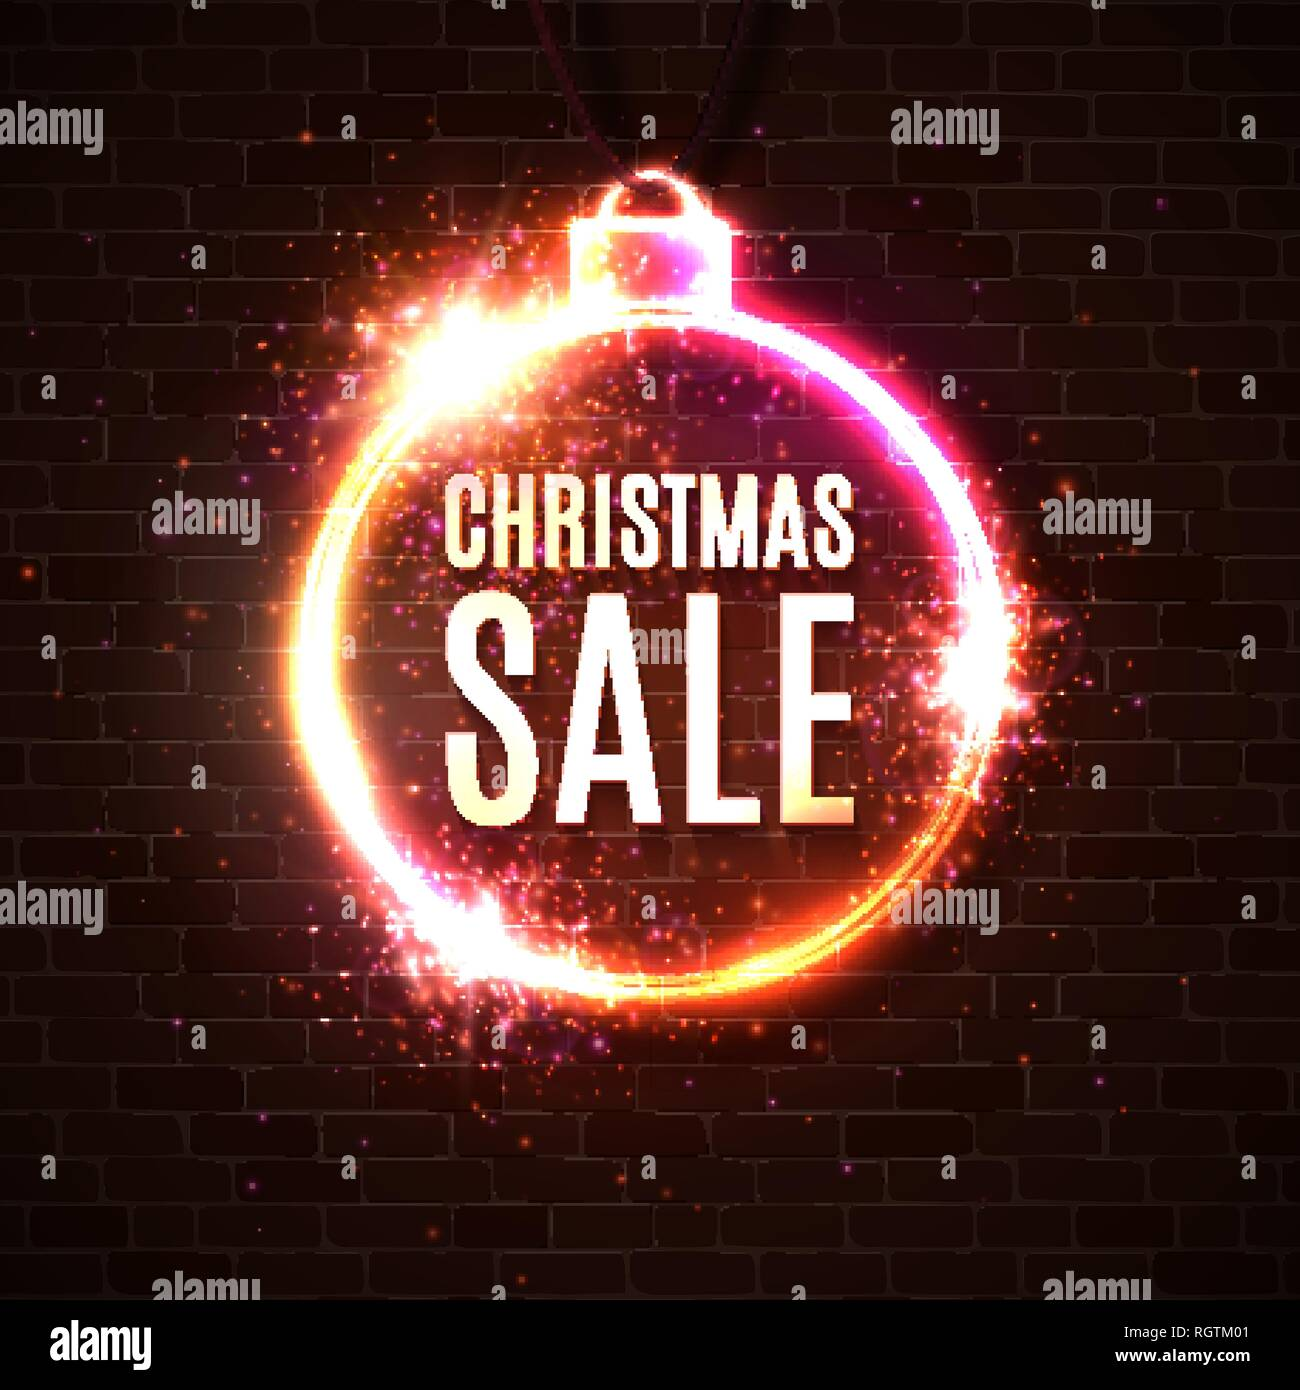 Christmas sale discounts banner. Neon style illuminated card postcard on dark red brick wall. Neon sign luminous poster night advertising Christmas sa - Stock Vector